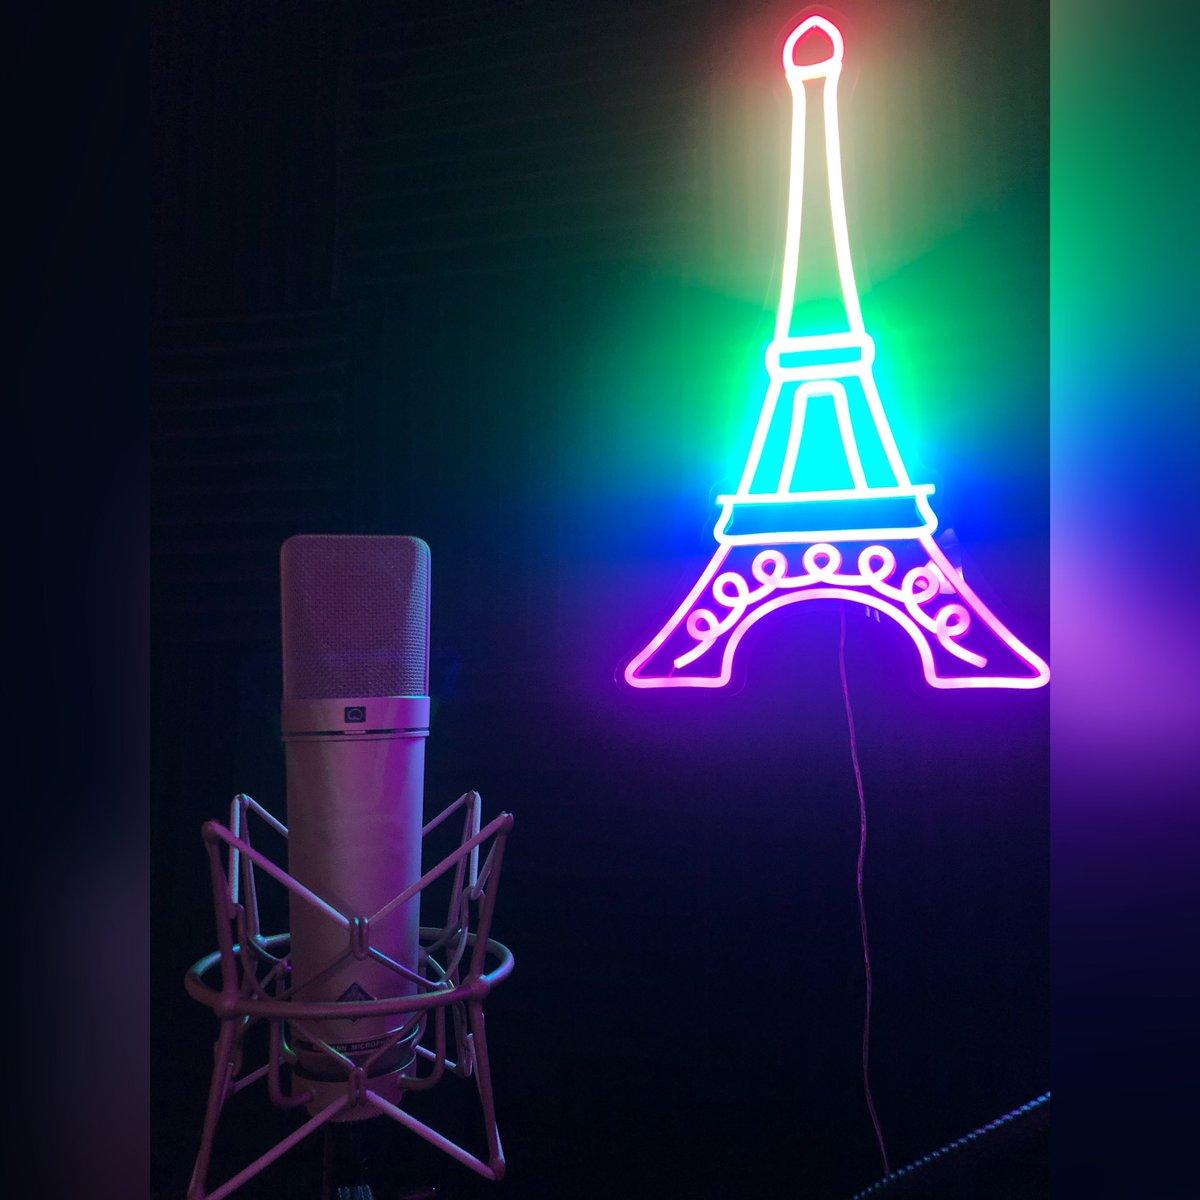 Have You Ever Been to PARIS? Book PARIS Studios❕  DM me  #music #producer #engineer #rapper #singer #rap #sing #Beats #studio #RecordingStudio #LogicPro #Ableton #ProTools #MusicStudio #ExplorePage #BurbankStudio #ParisStudios #Paris #ApollTwin #NeumannU87 #ParisP #Book #BookNow https://t.co/NVA0Af54yl